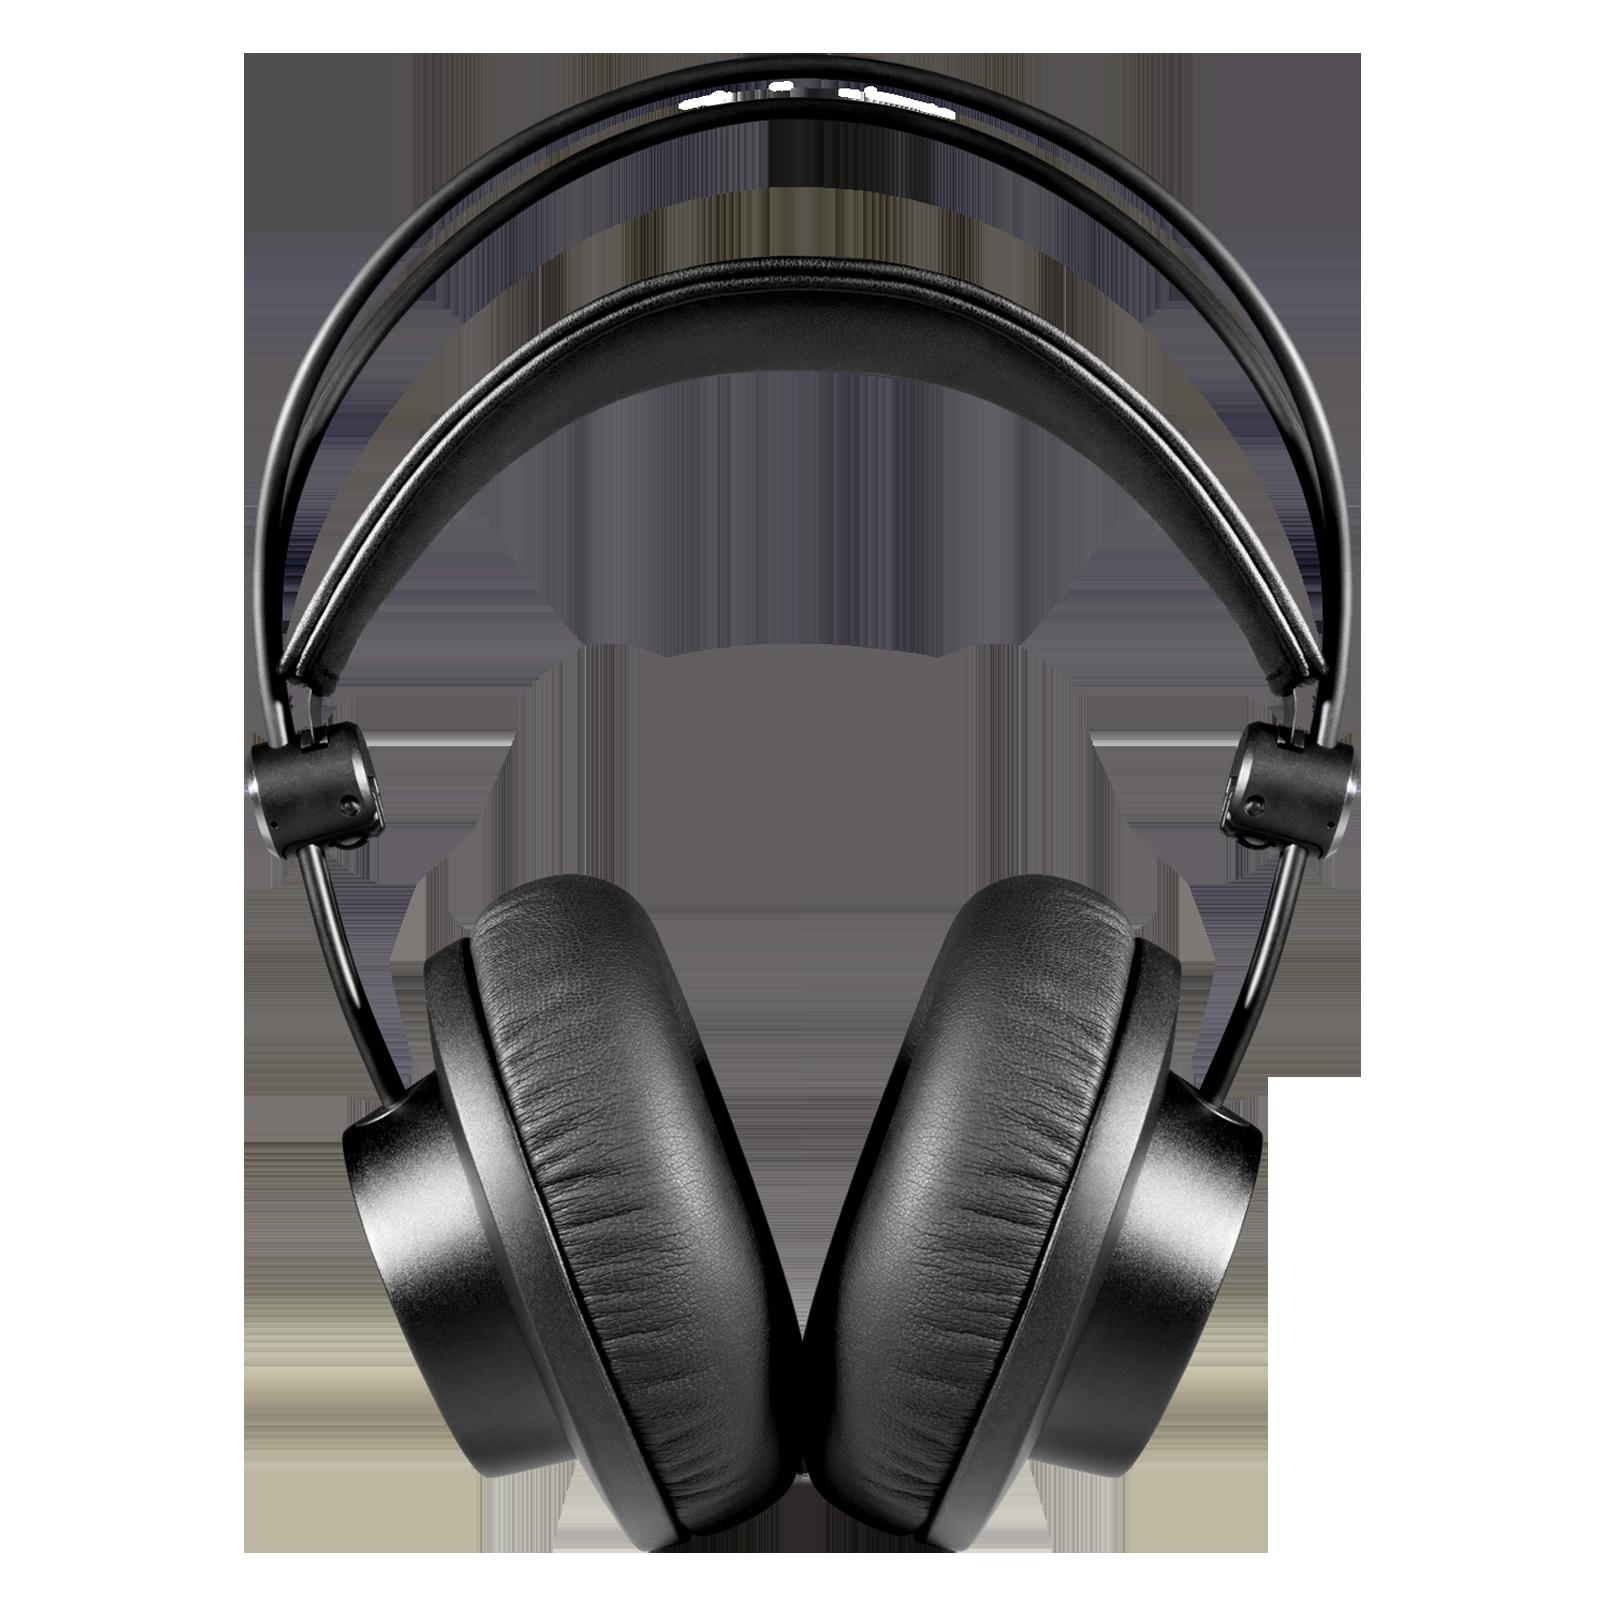 K245 - Black - Over-ear, open-back, foldable studio headphones - Front